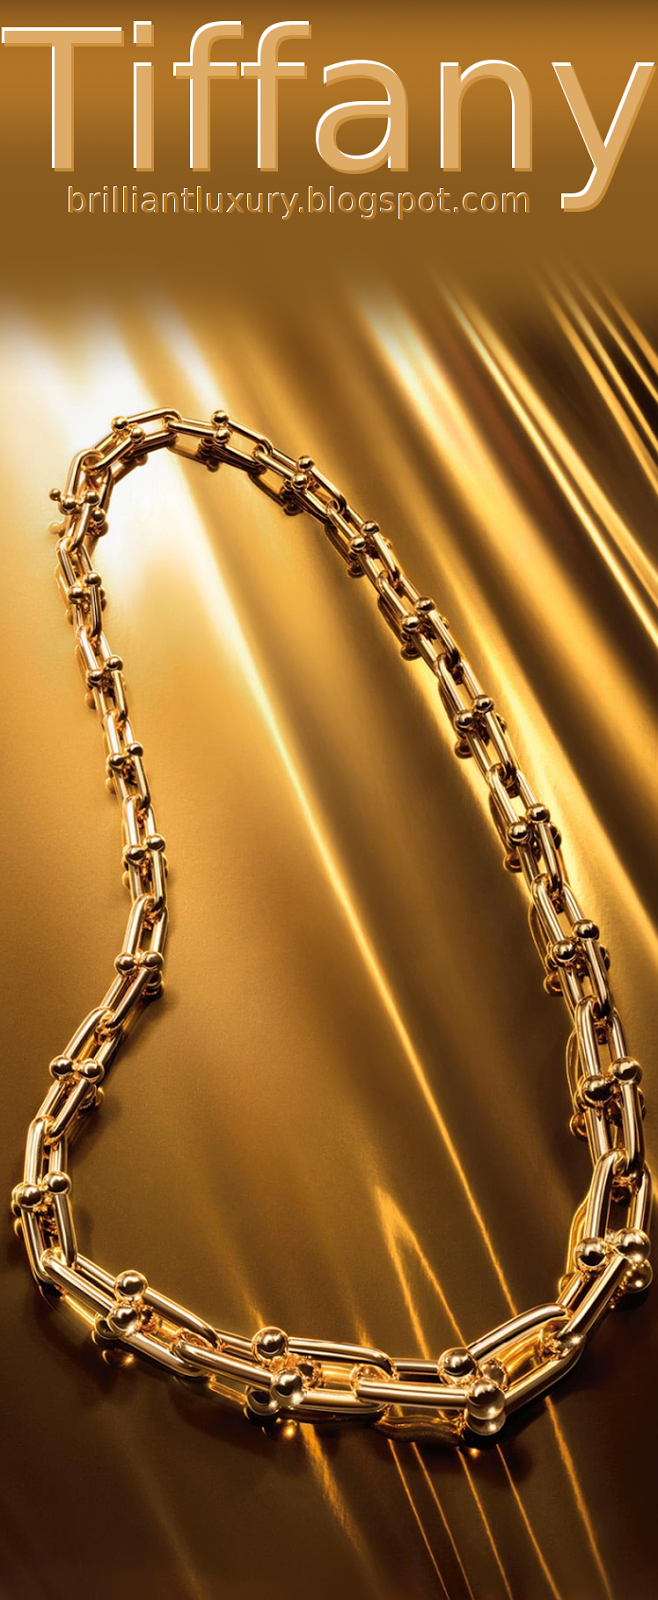 Brilliant Luxury ♦ Tiffany hardwear link necklace in 18k gold